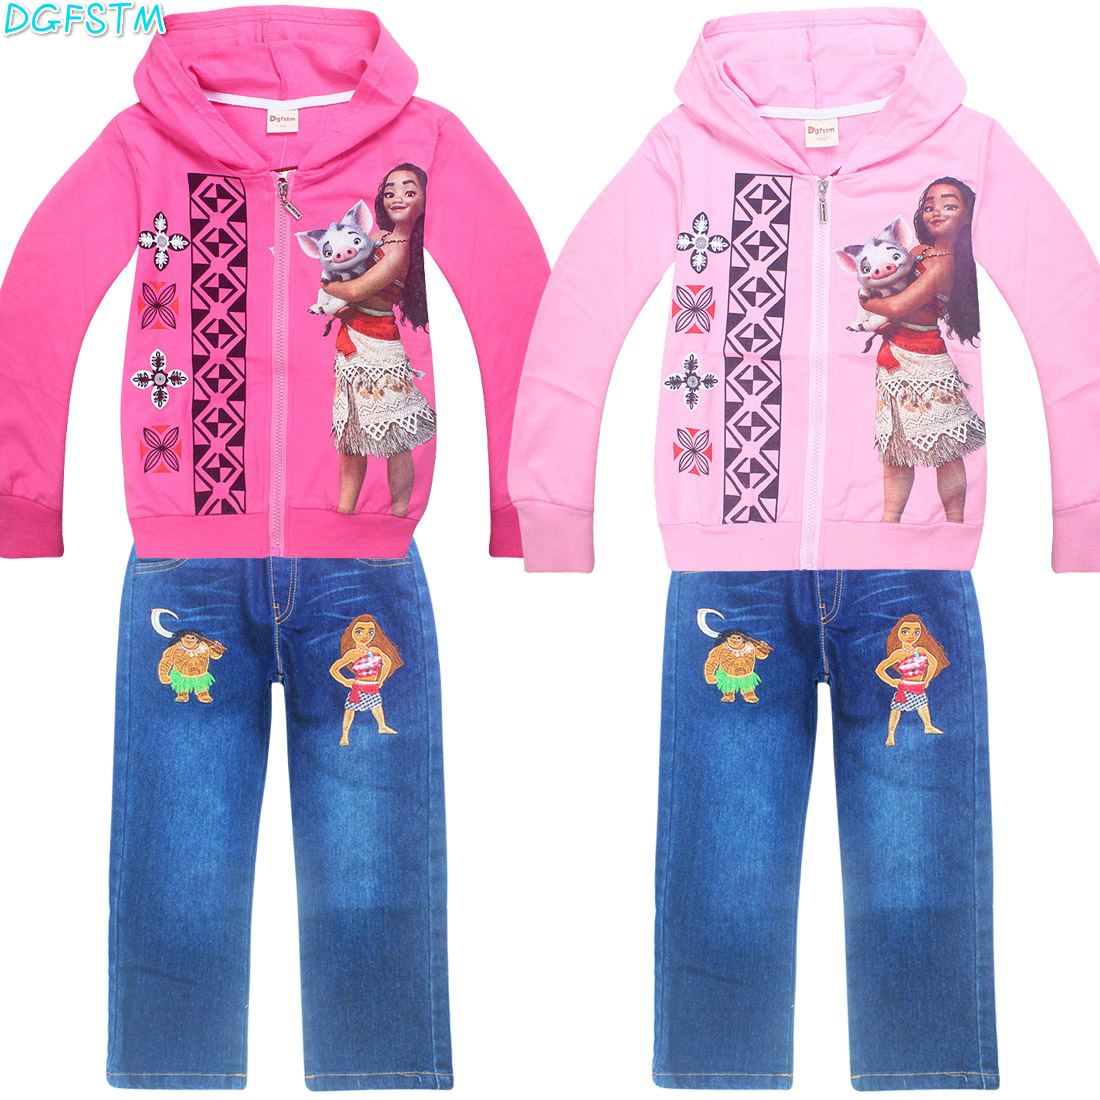 2017 Long Sleeve Kids Clothes Children Autumn Tiny Cotton Boys Girls T Shirt Tees fantasia moana Printing Vaiana Kids Clothes